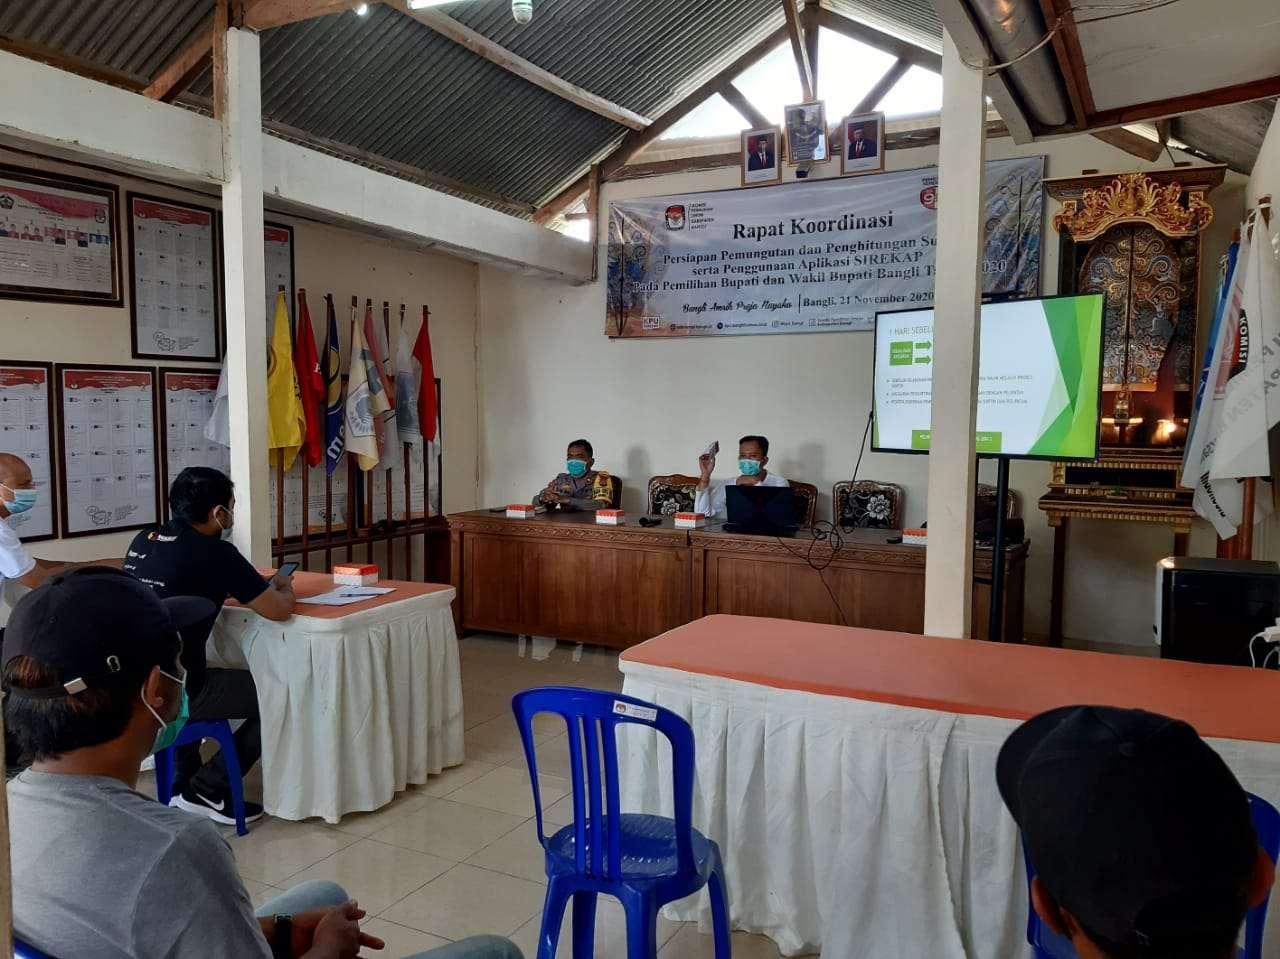 Wakapolres Hadiri Rapat Persiapan Penyortiran dan Pelipatan Surat Suara di KPU Bangli